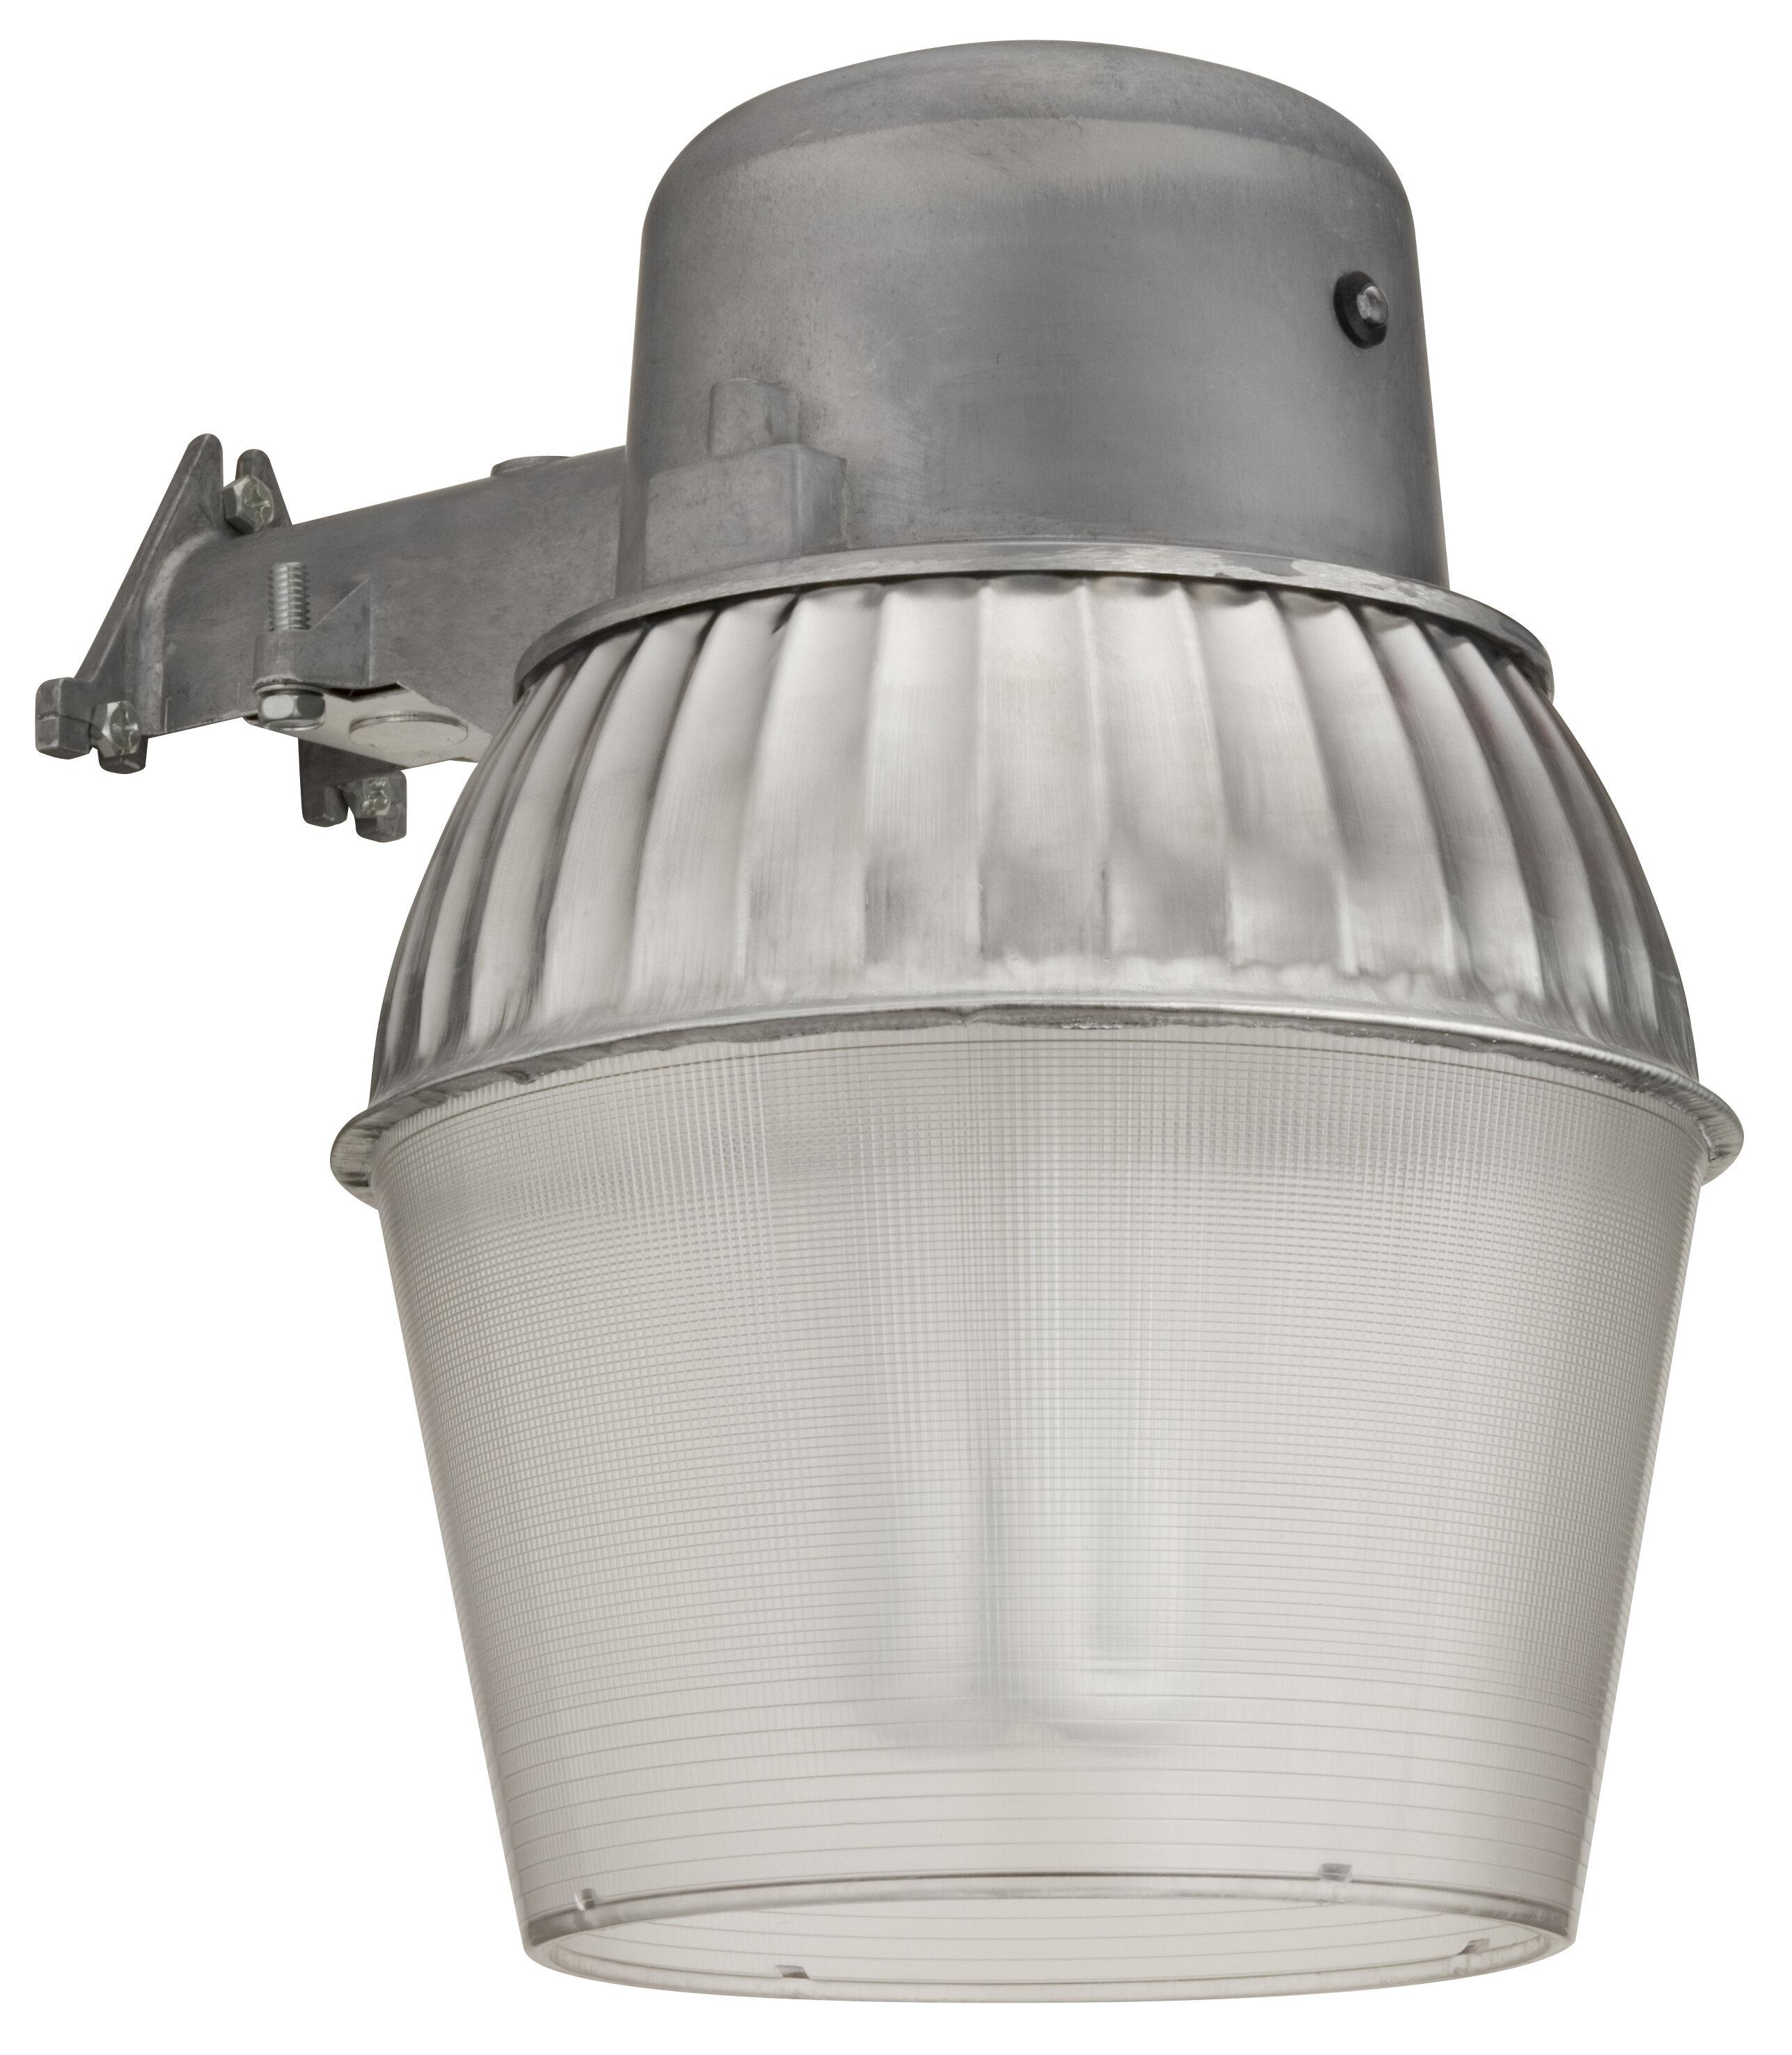 Lithonia Lighting Dusk To Dawn Outdoor Security Area Light Reviews Wayfair